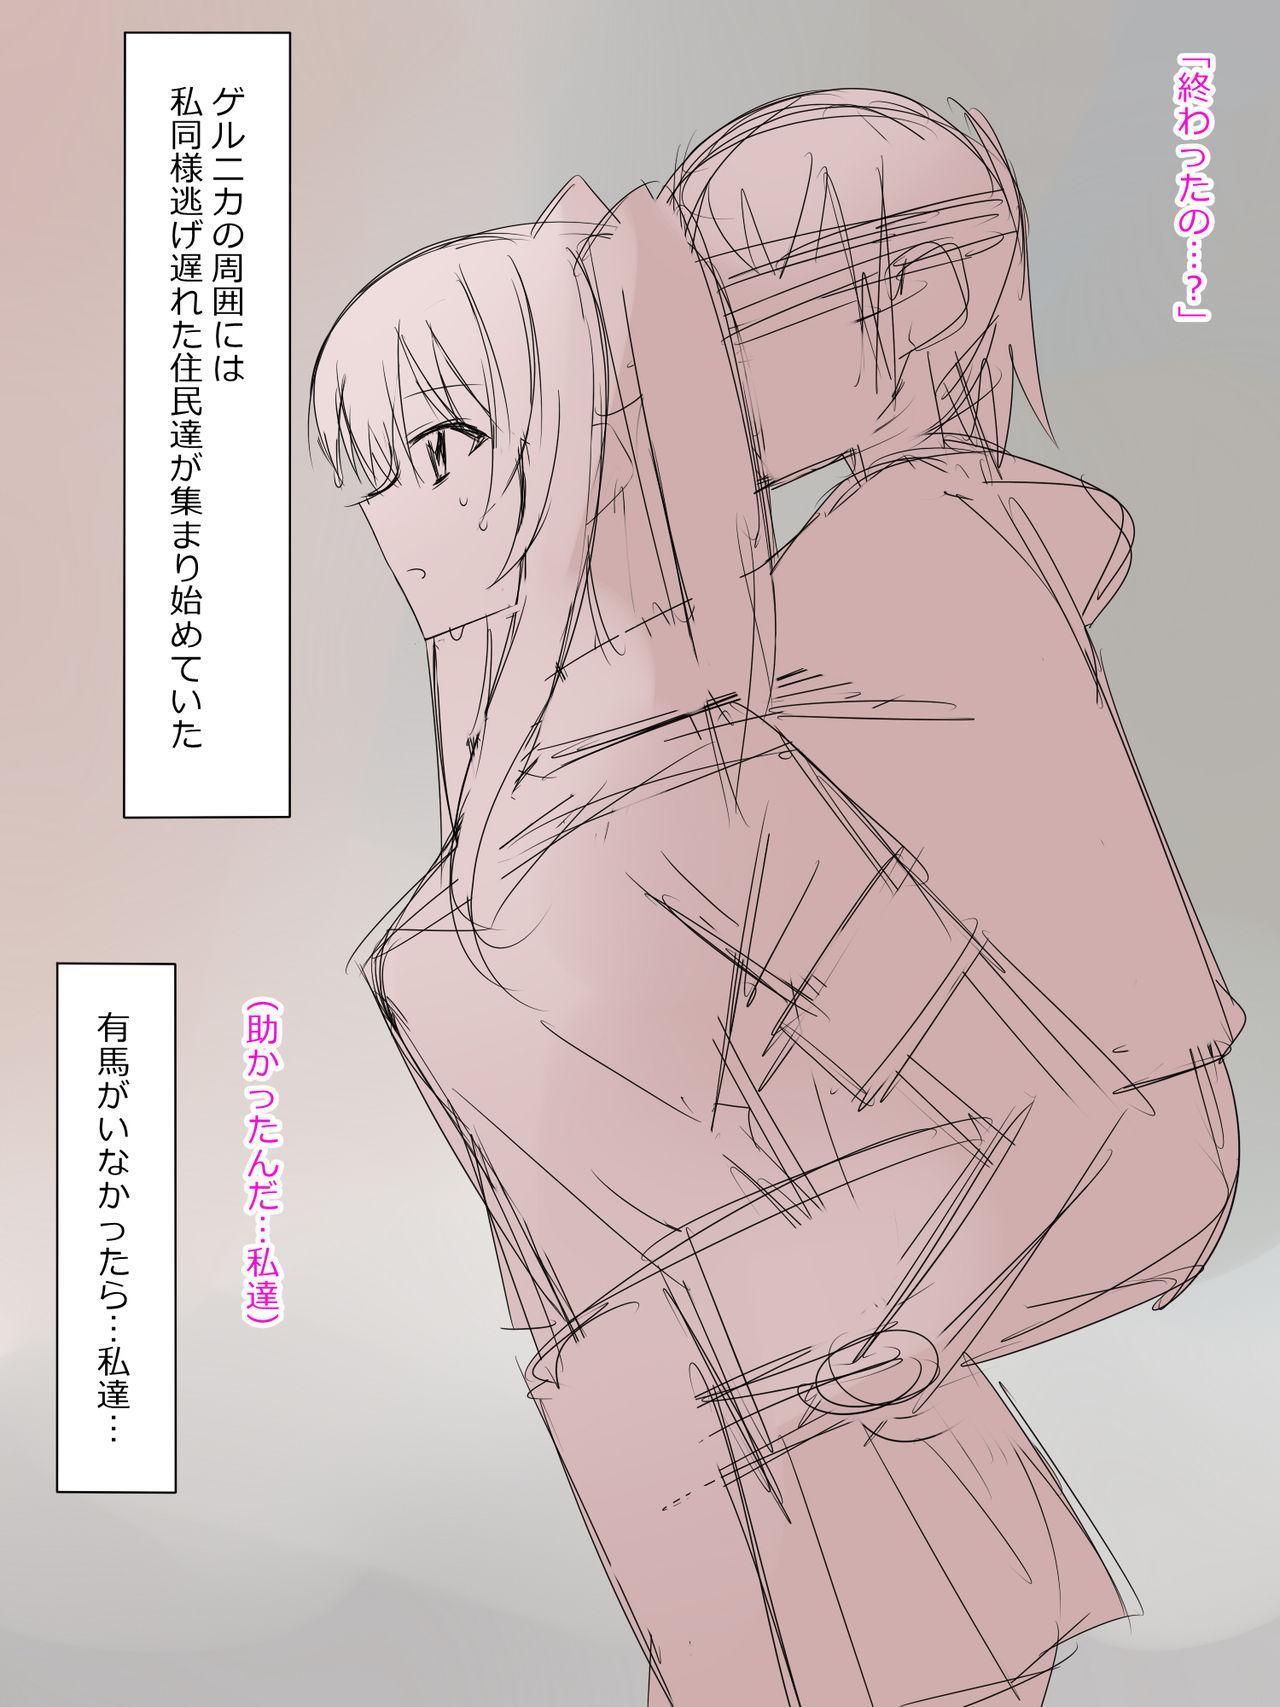 [Kagemusha] Arima-kun to 40-nin no Classmate 21